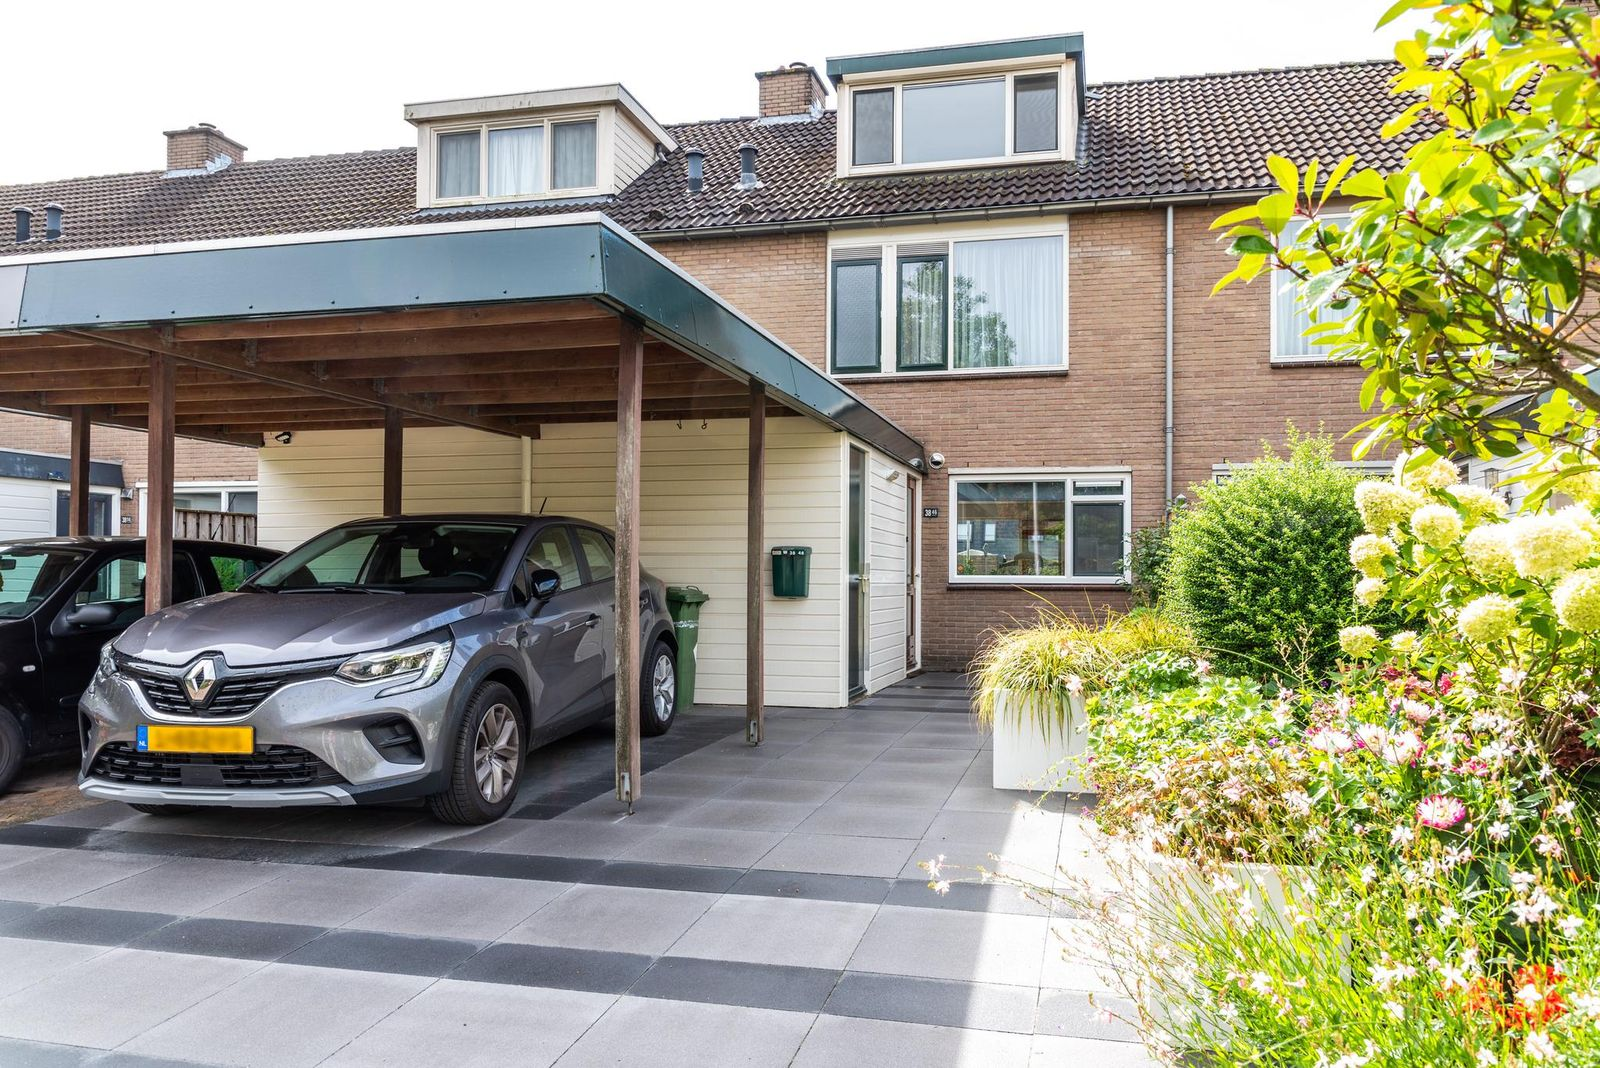 Zwanenveld 3846, Nijmegen